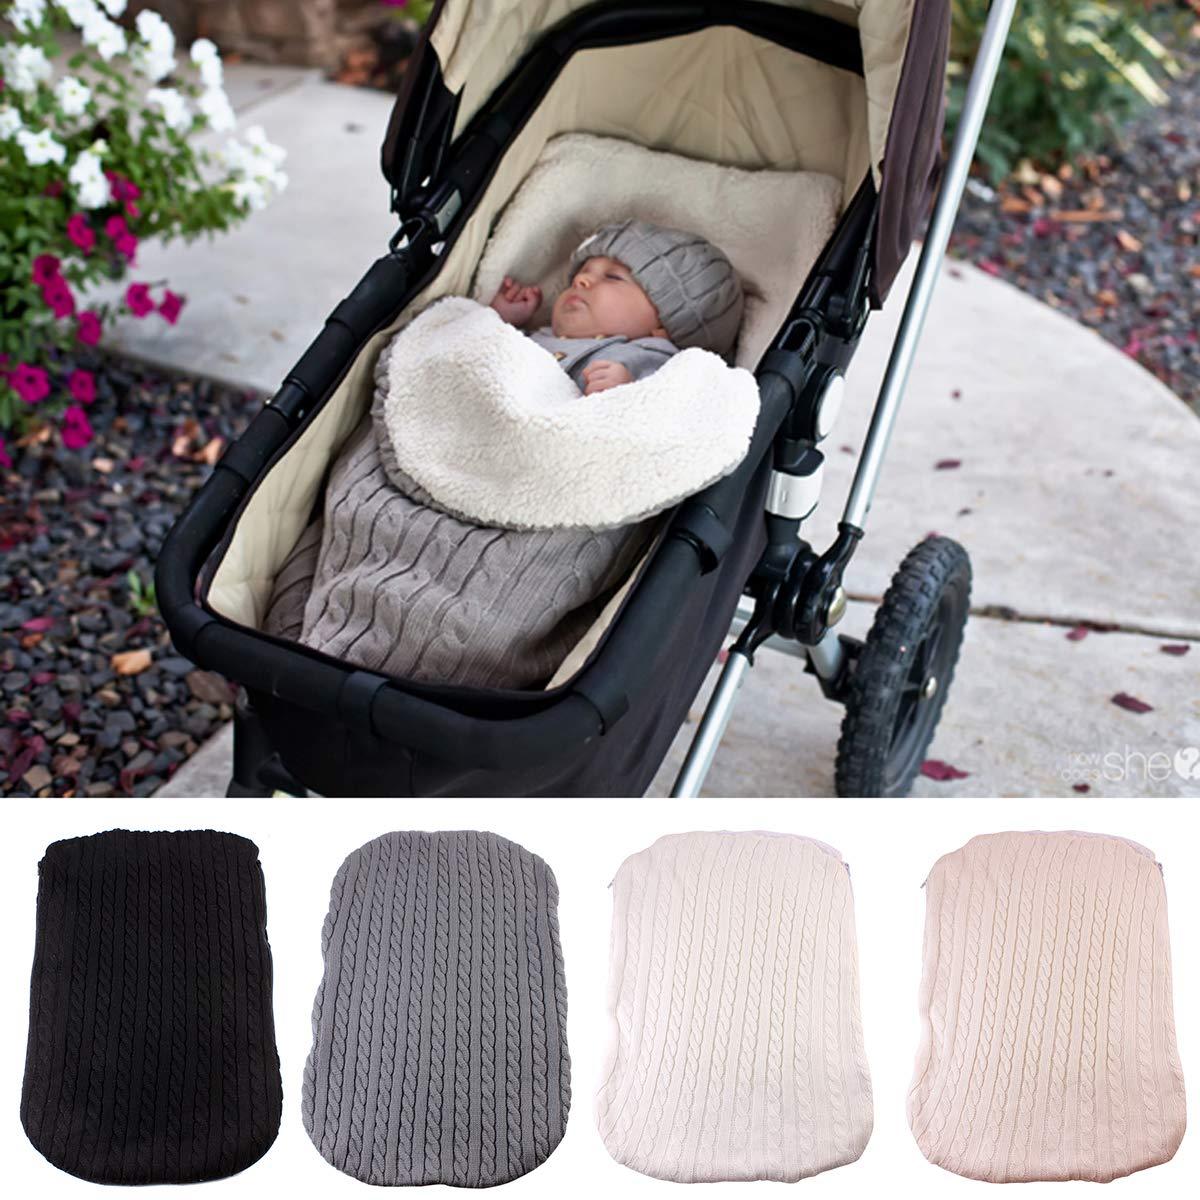 Baby coperta per passeggino Wrap coperta in pile a pelo pi/ù velluto.